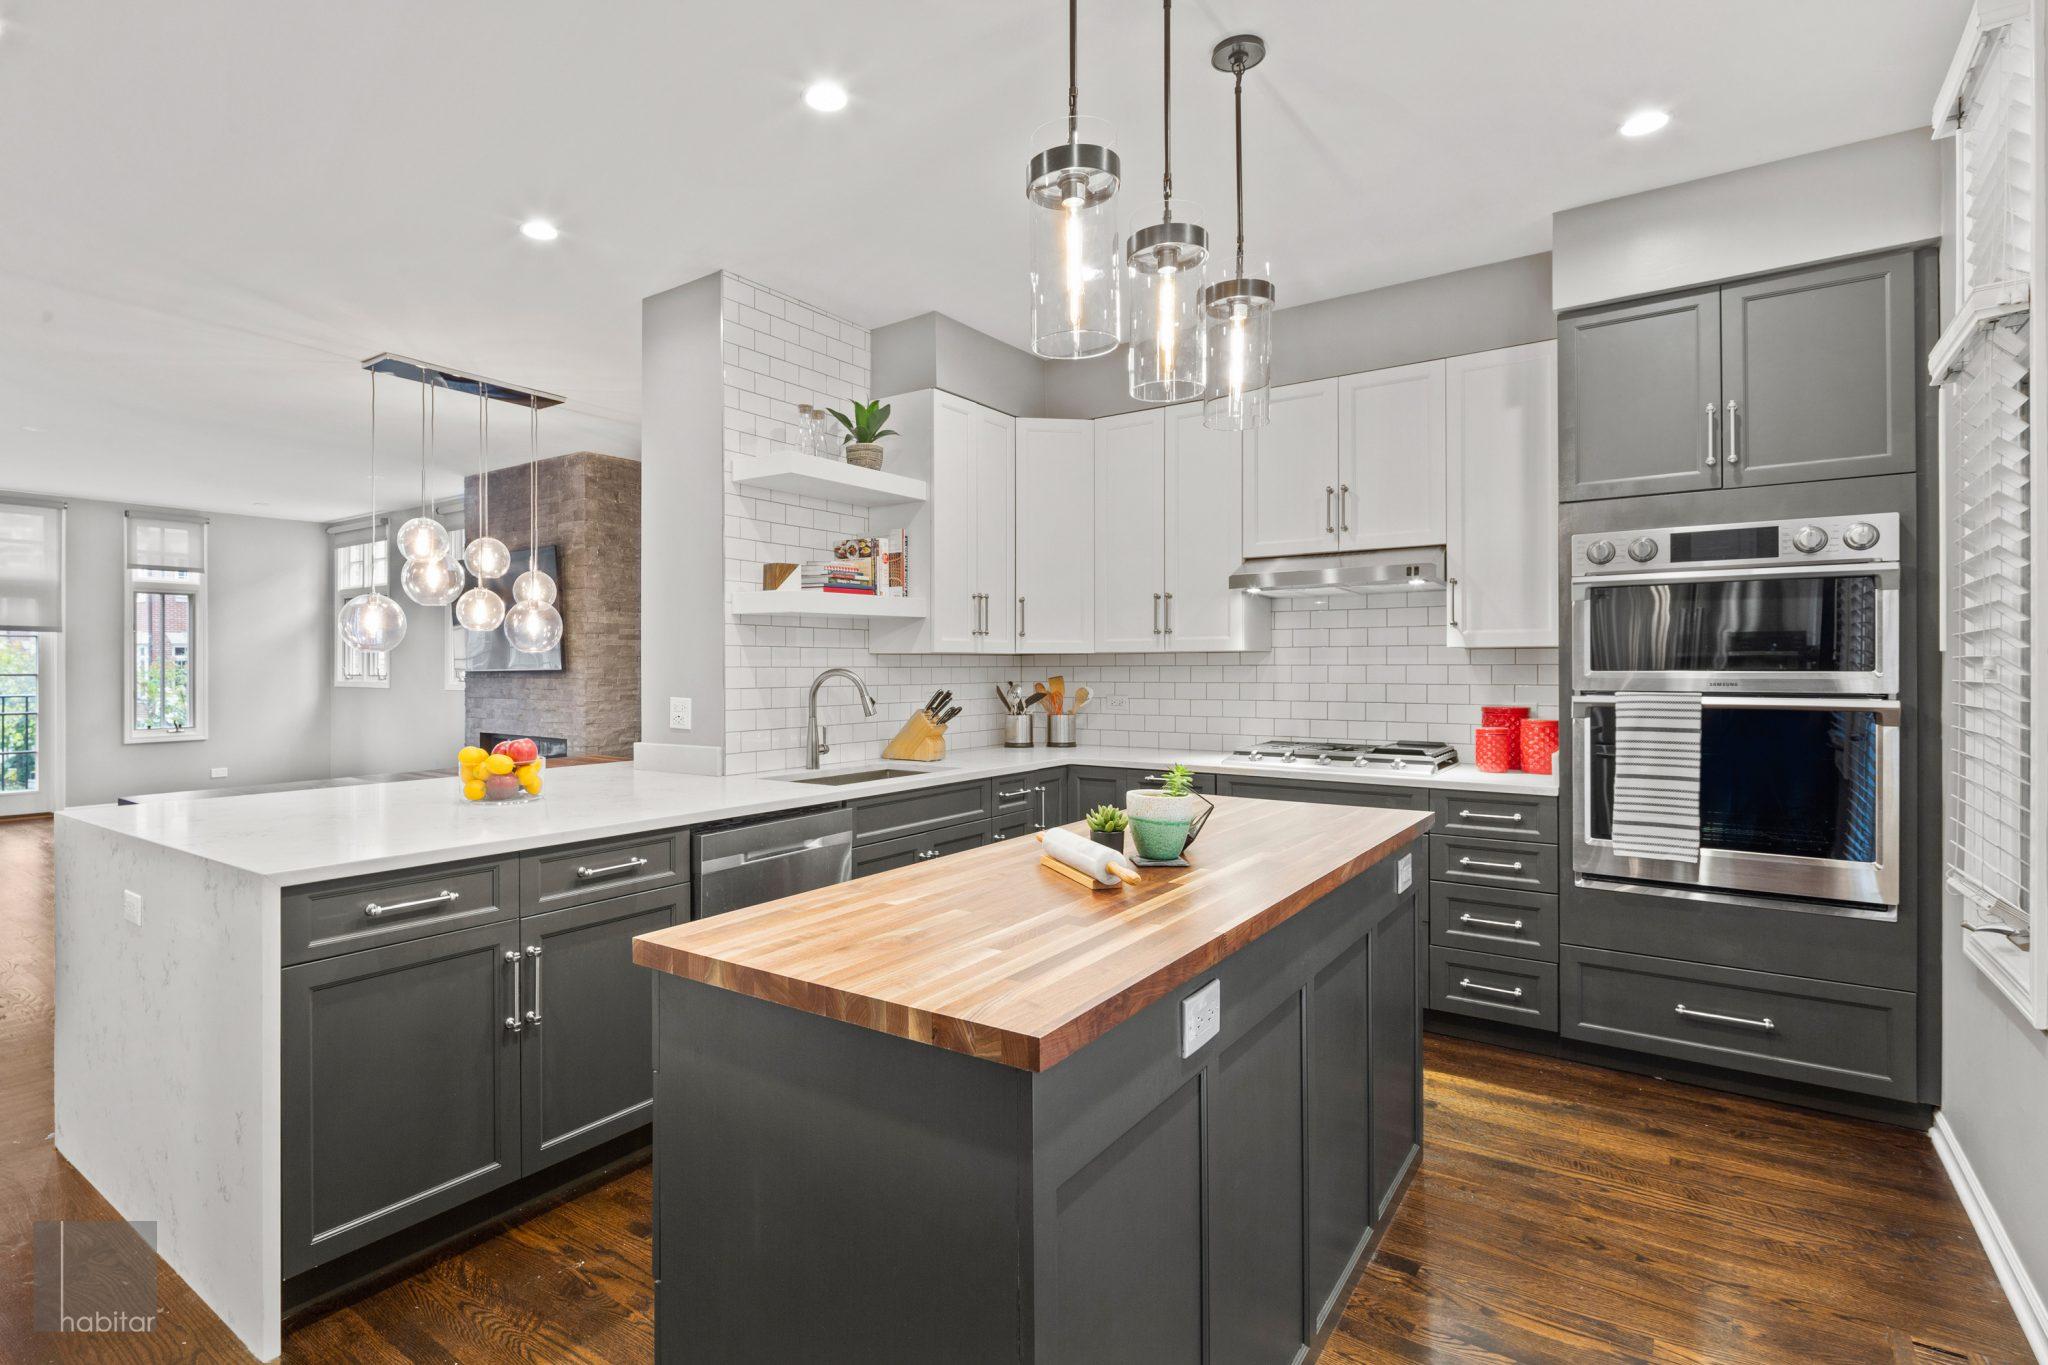 9 Trends in Two Tone Kitchen Design – Habitar Interior Design